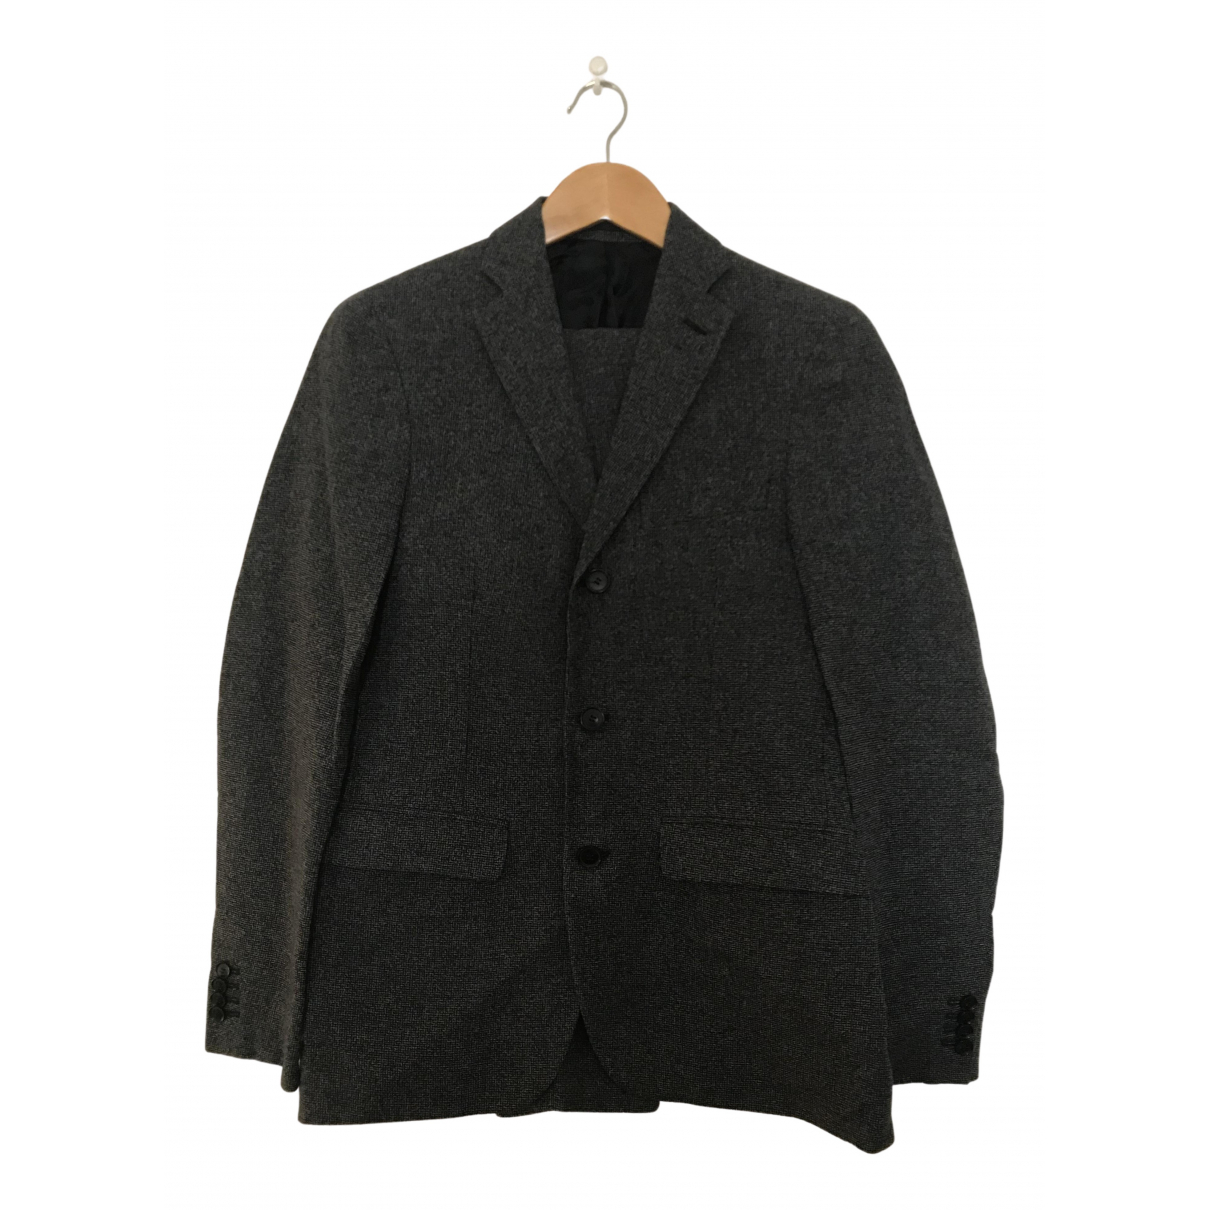 Acne Studios N Anthracite Linen Suits for Men 46 FR